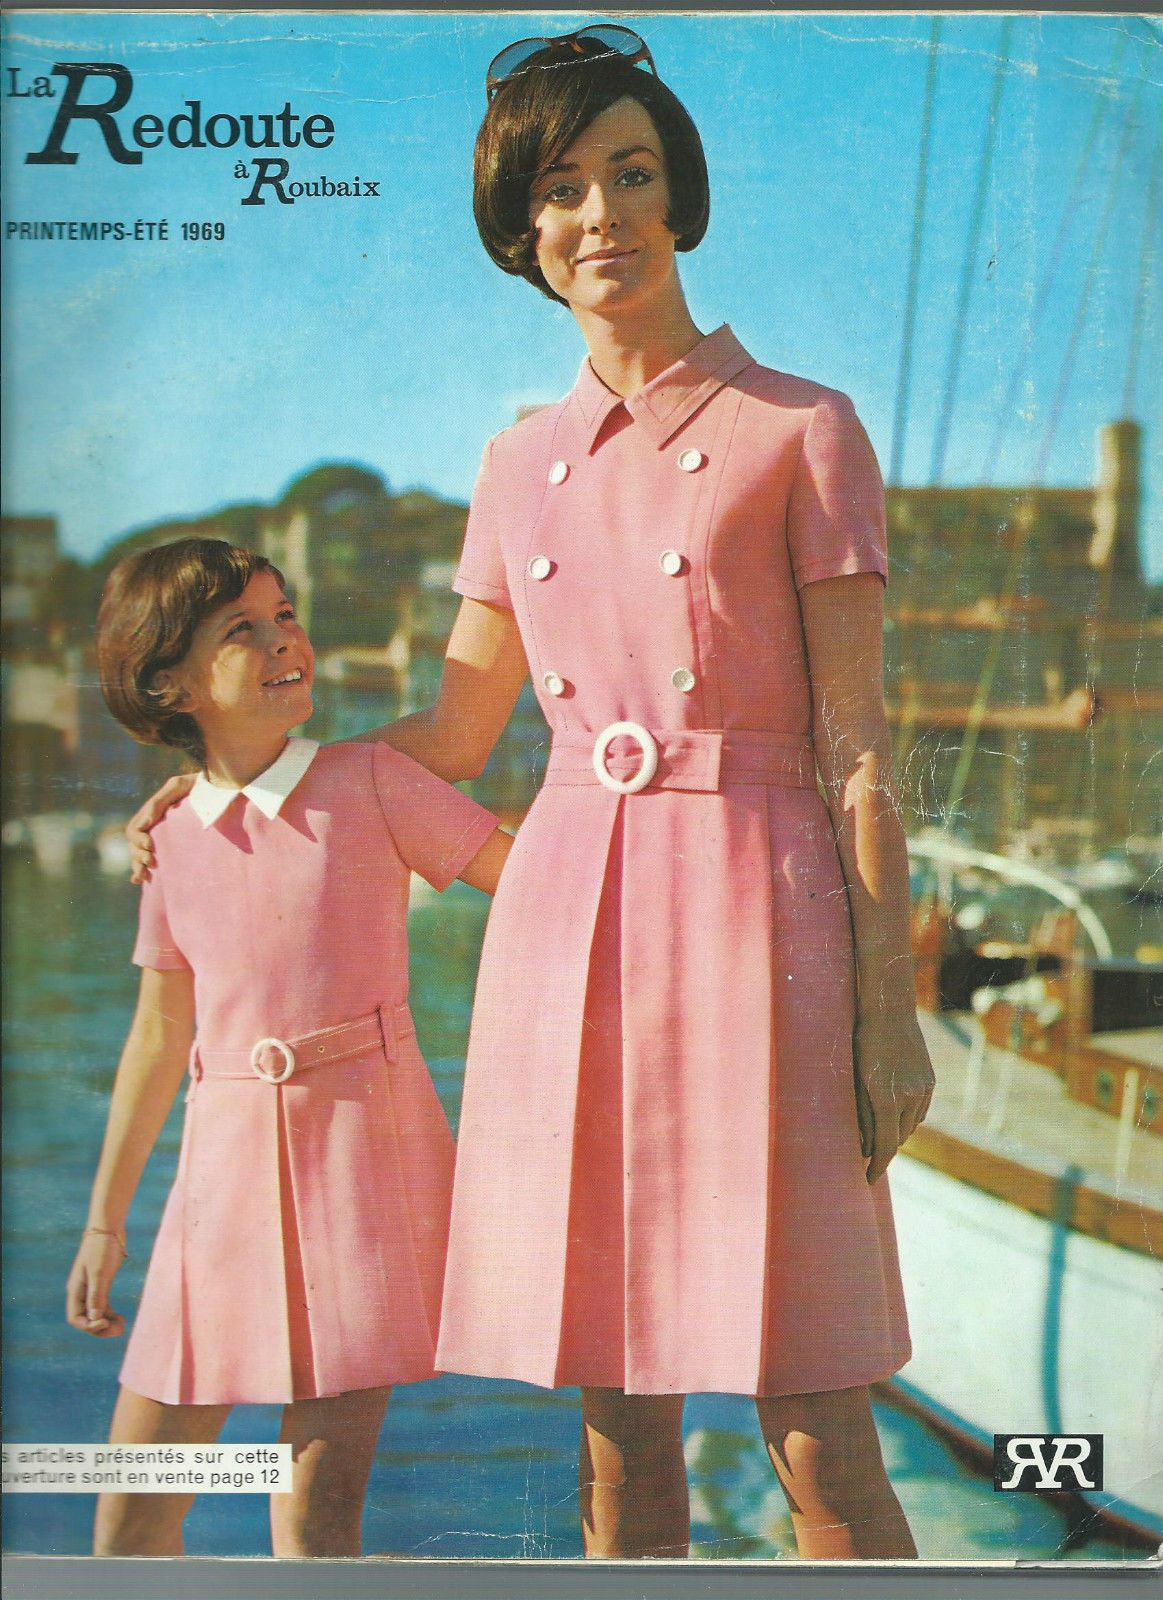 catalogue la redoute spring summer 1969 ebay unforgettable moment pinterest. Black Bedroom Furniture Sets. Home Design Ideas